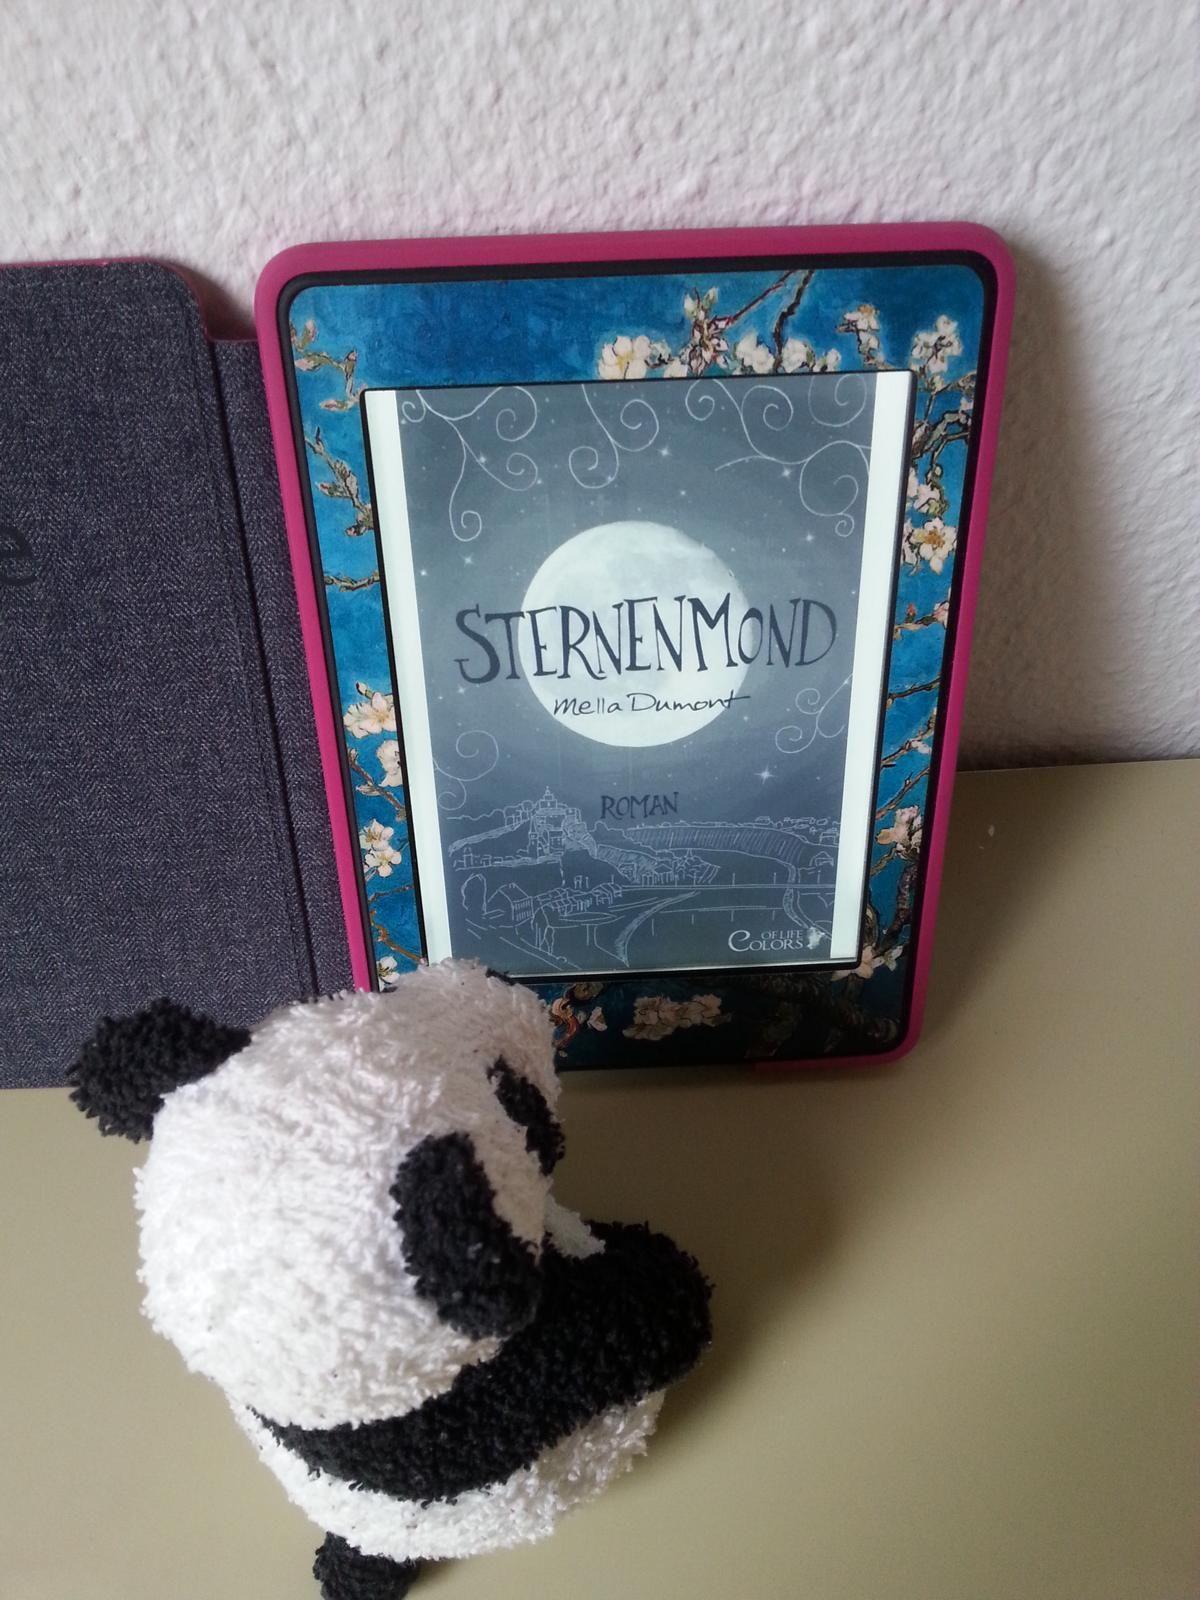 Lesefortschritt zu Colors of Life 3 - Sternenmond, Buch, Mella Dumont